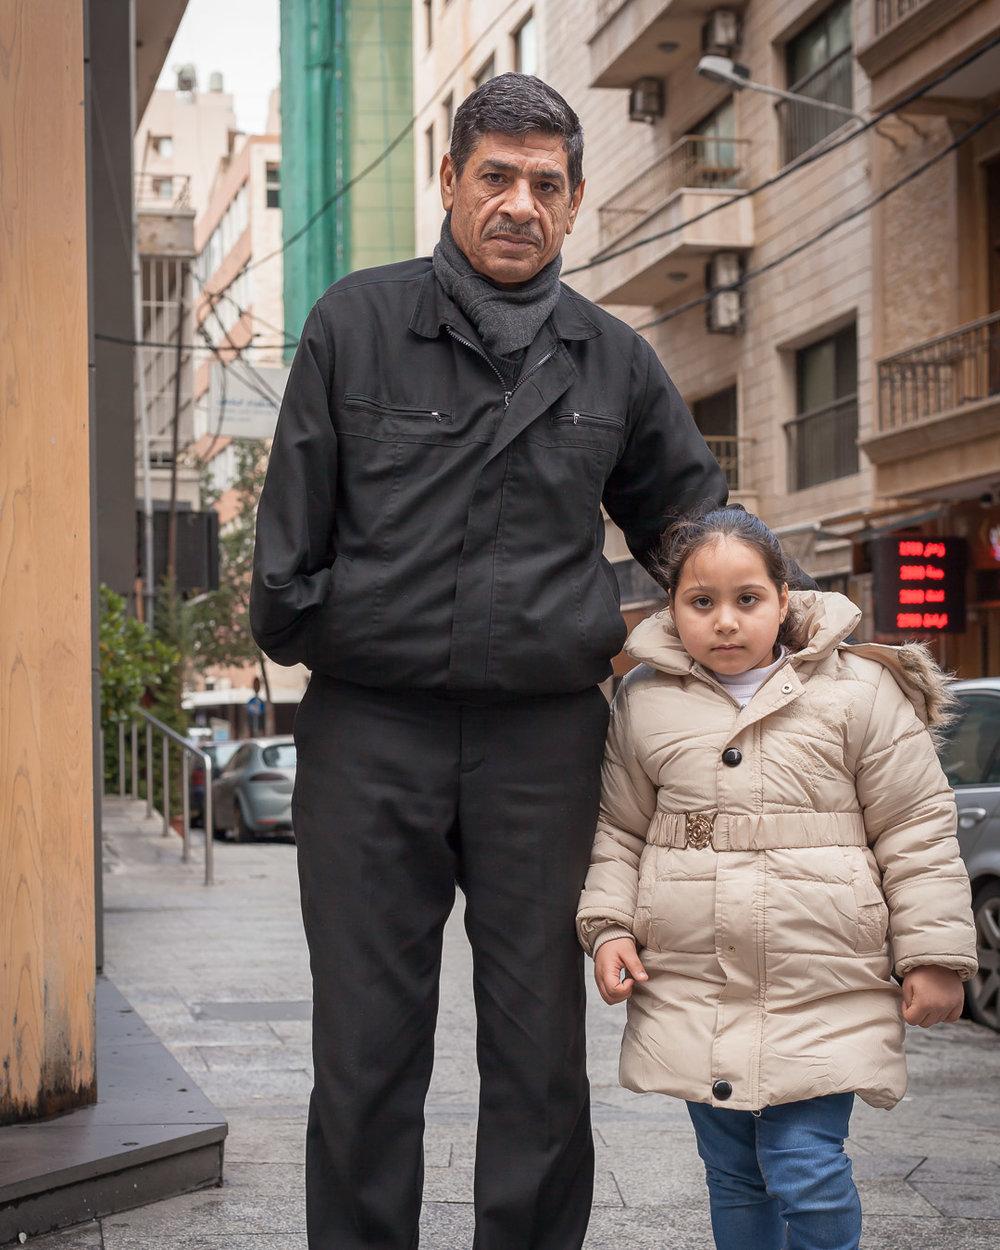 Taj with her grandfather.